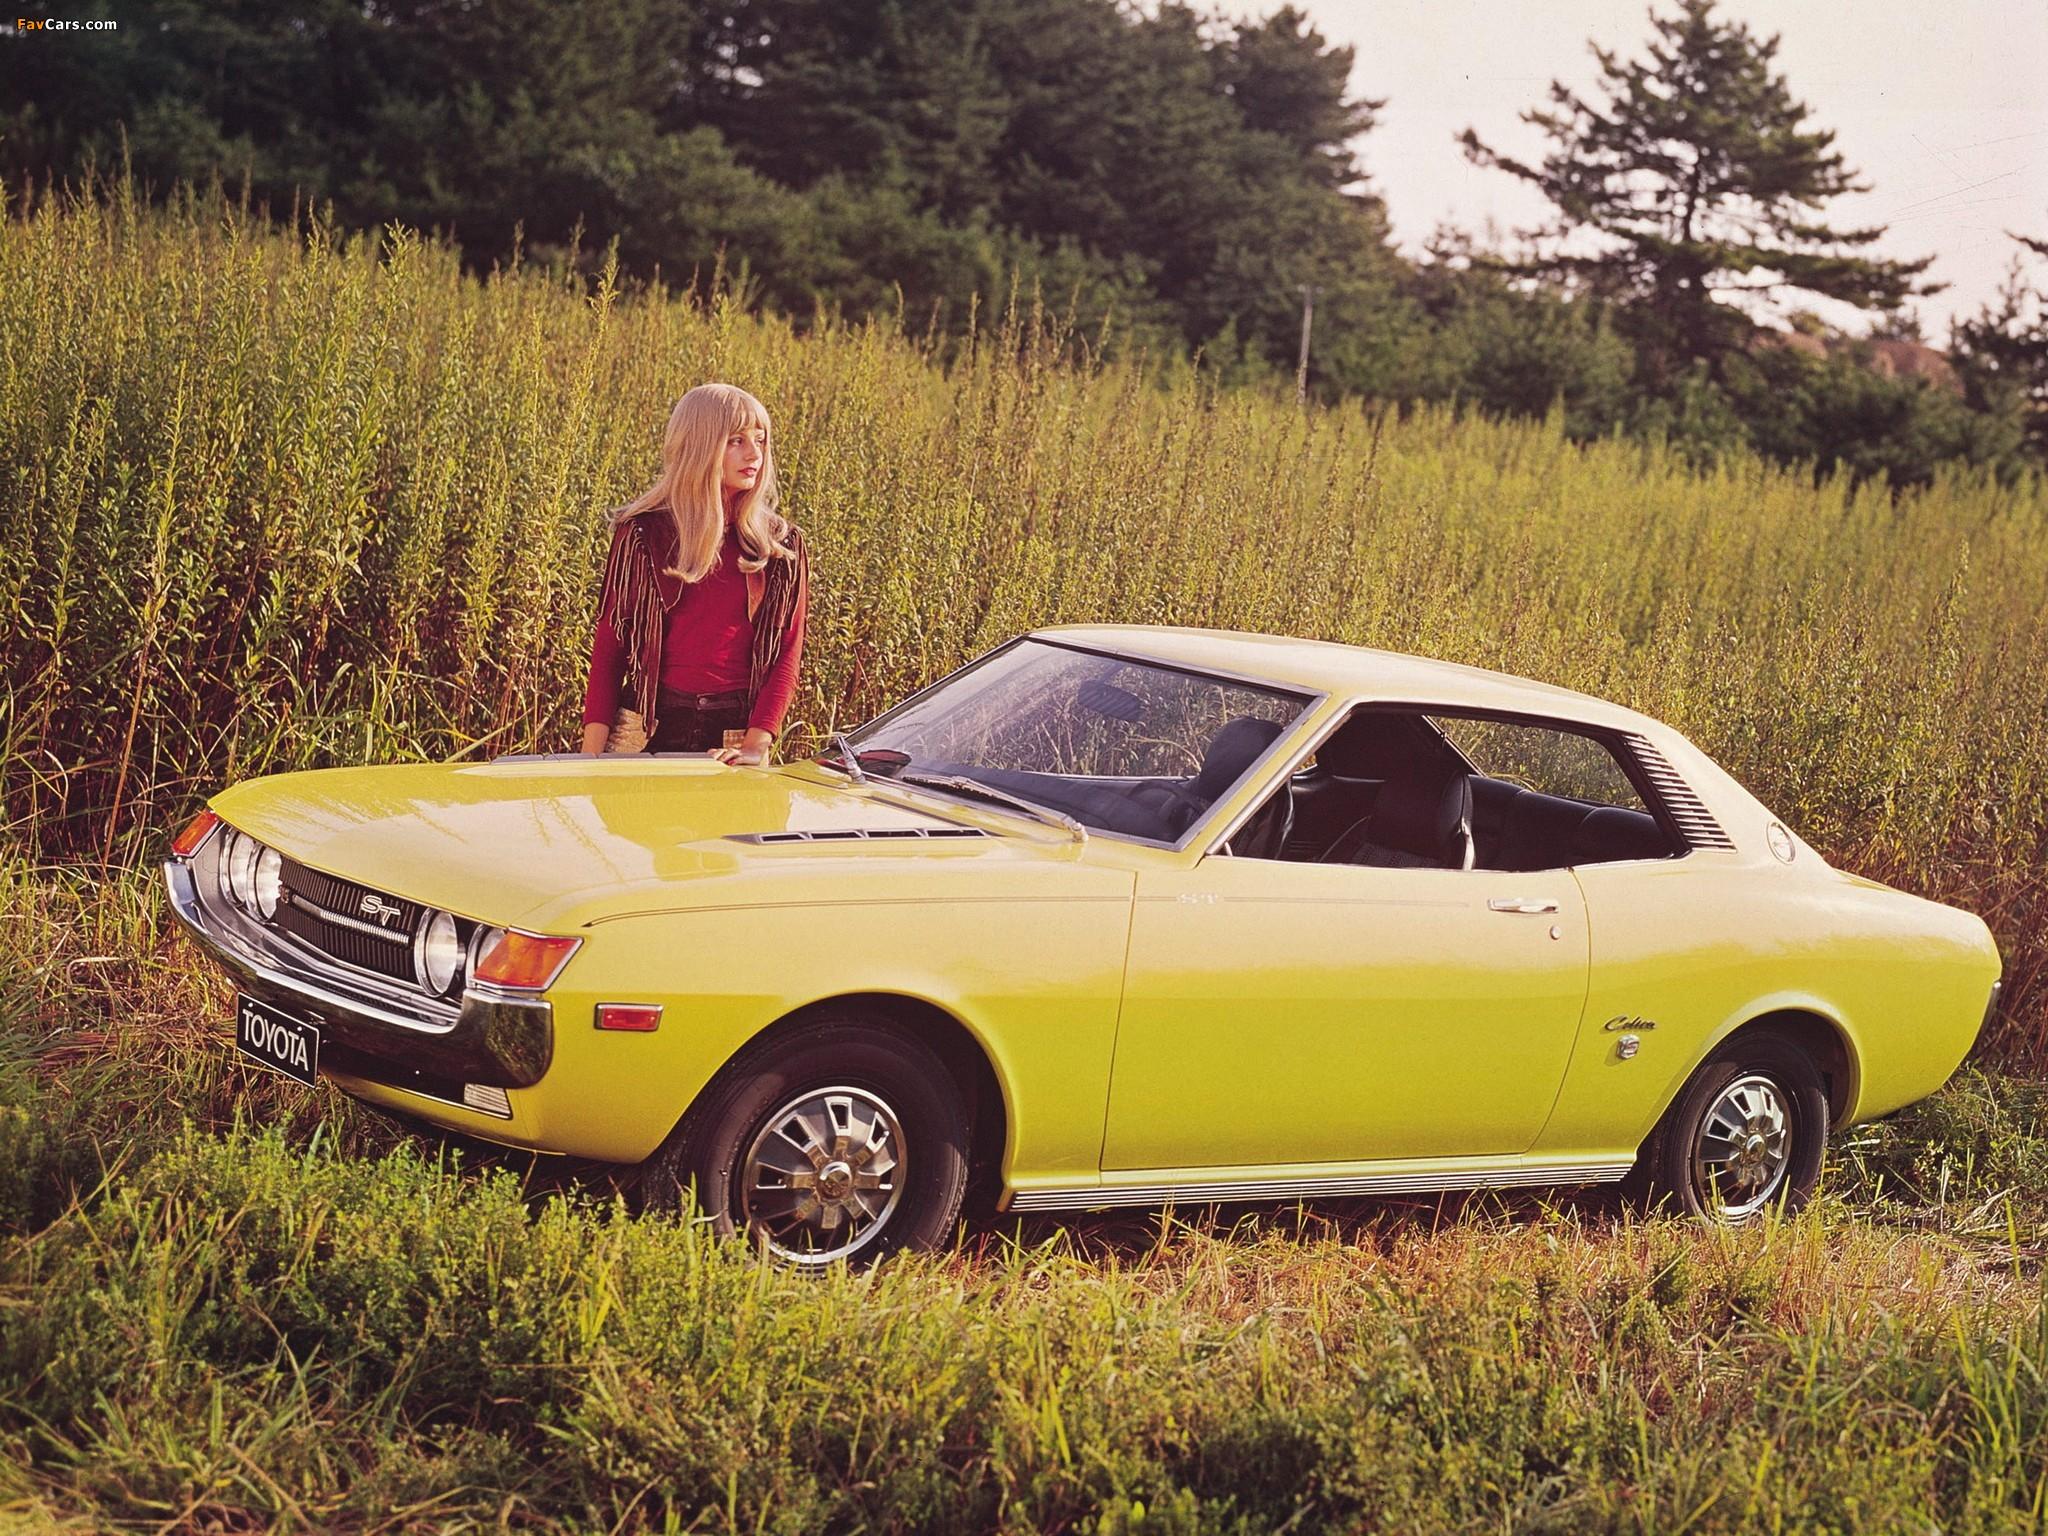 Toyota celica st coupe eu spec ta22 ra20 1972 75 pictures